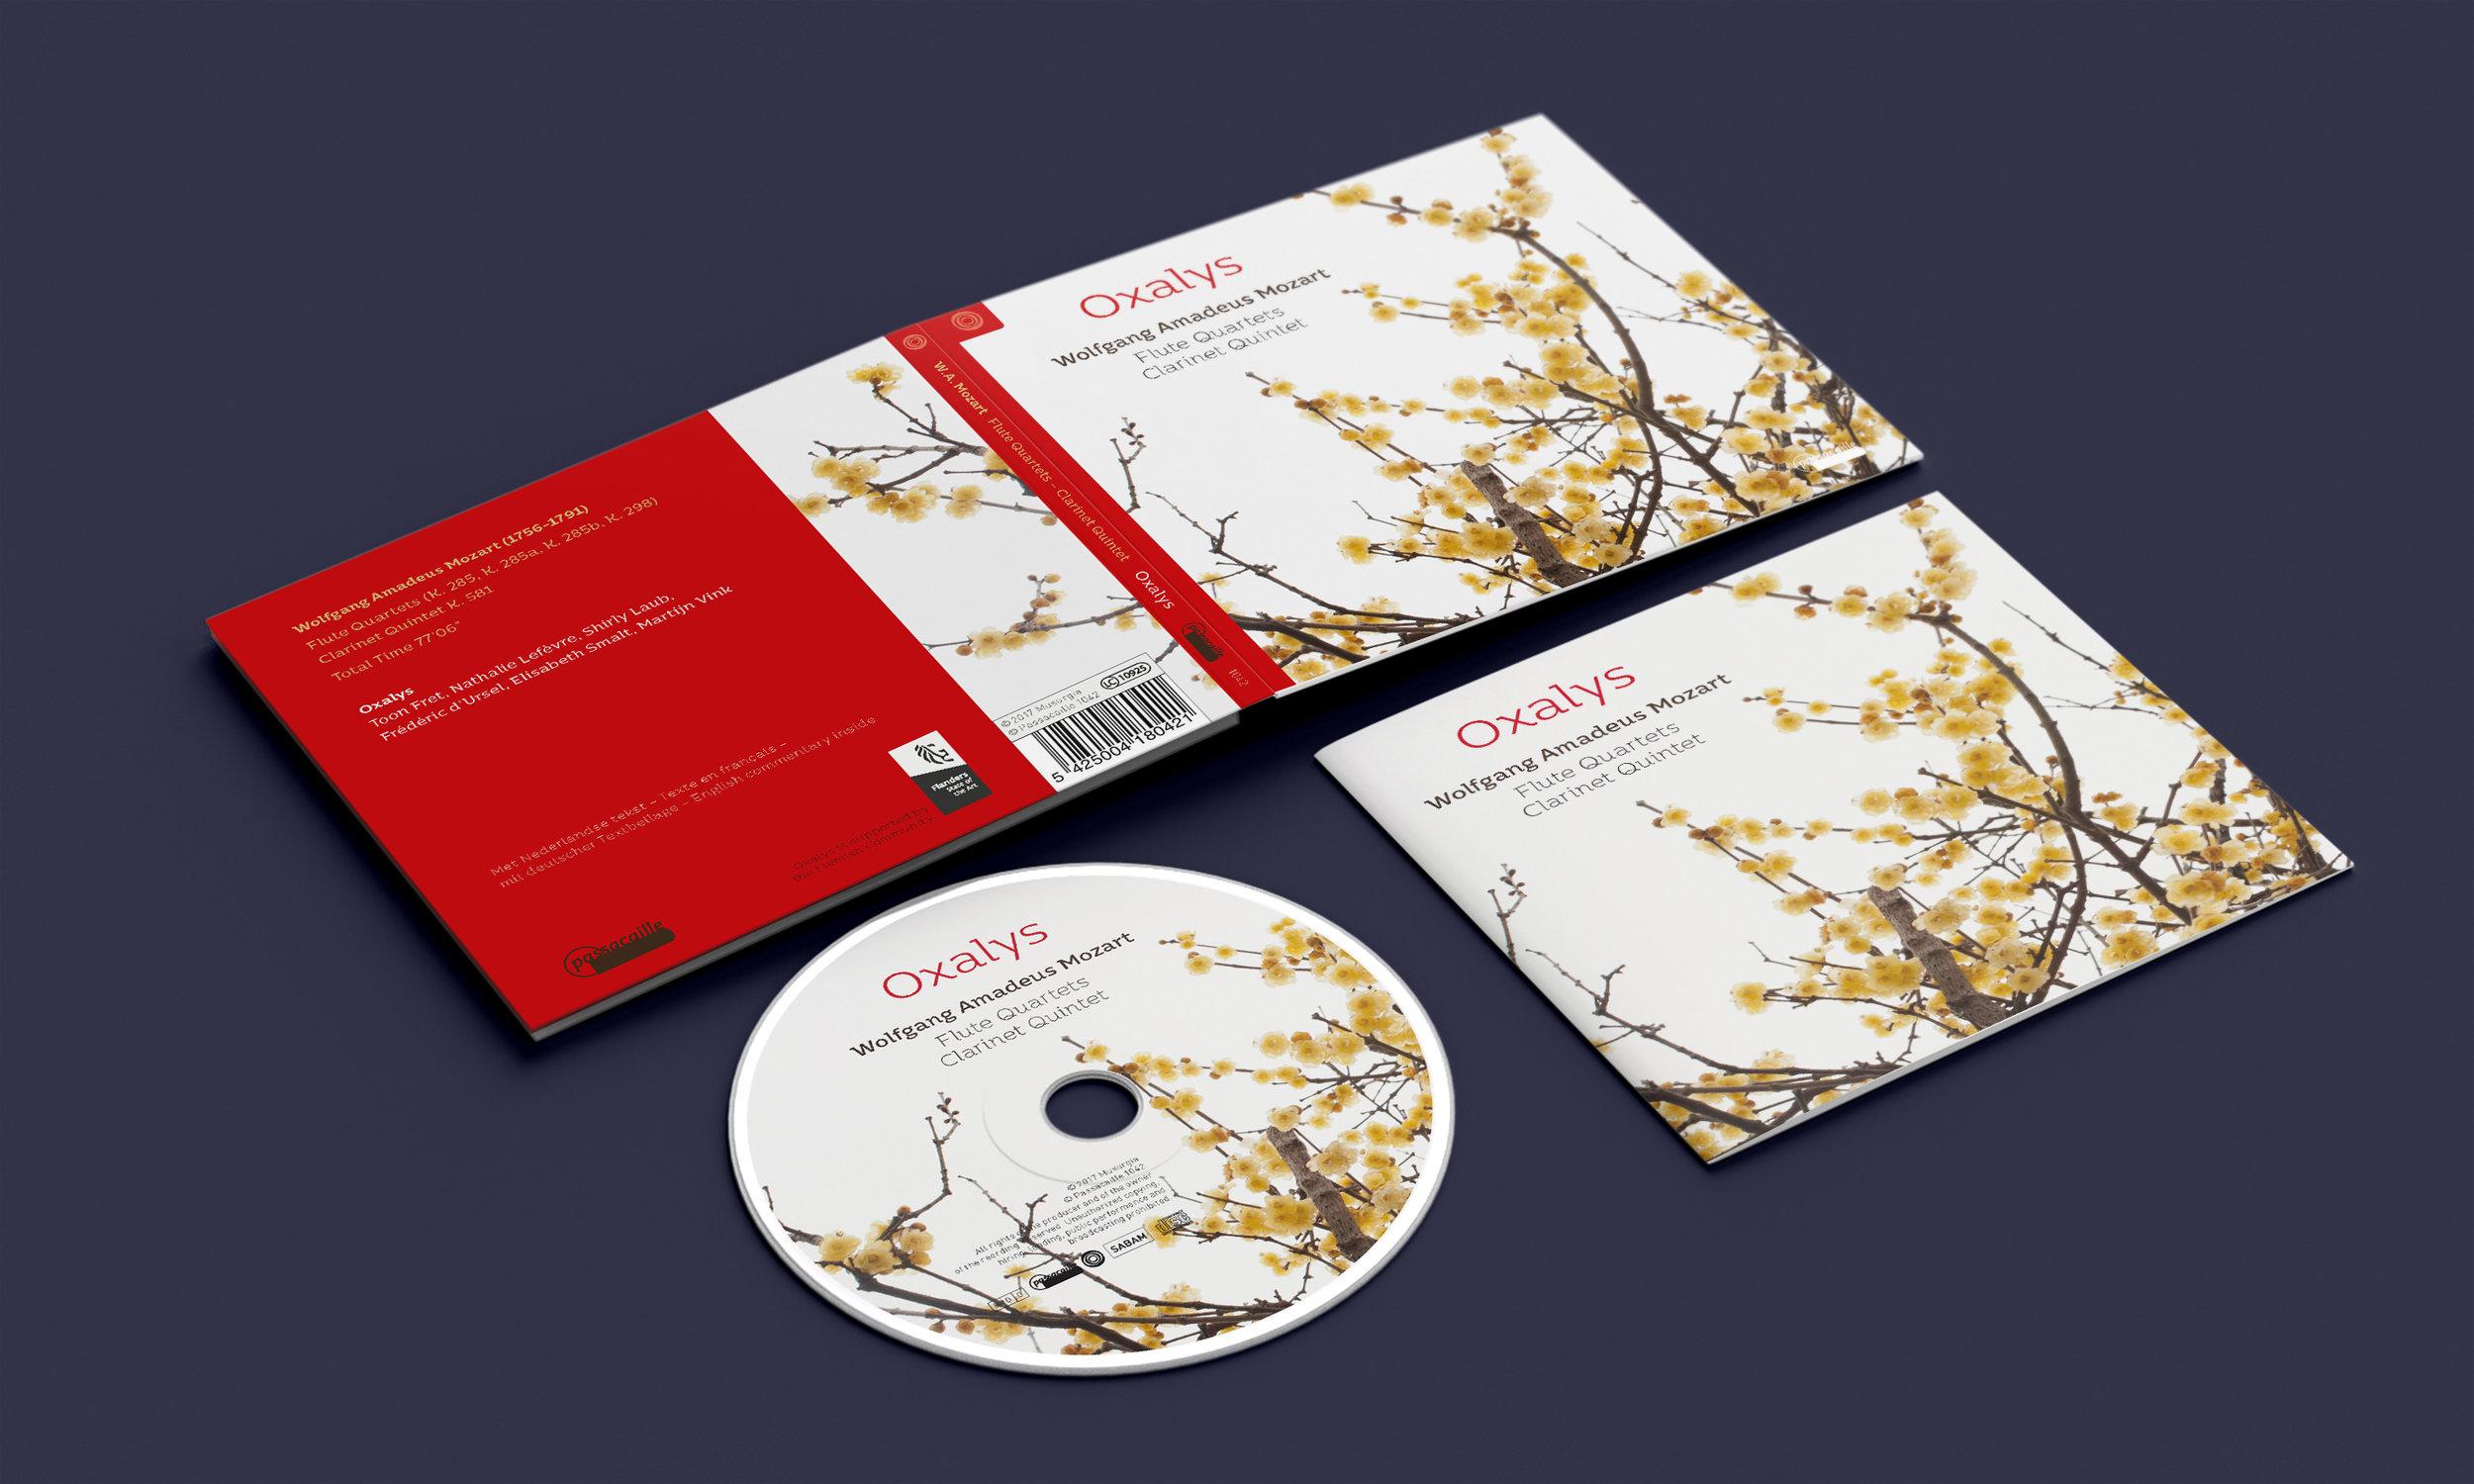 CD-digipack 'Wolfgang Amadeus Mozart'